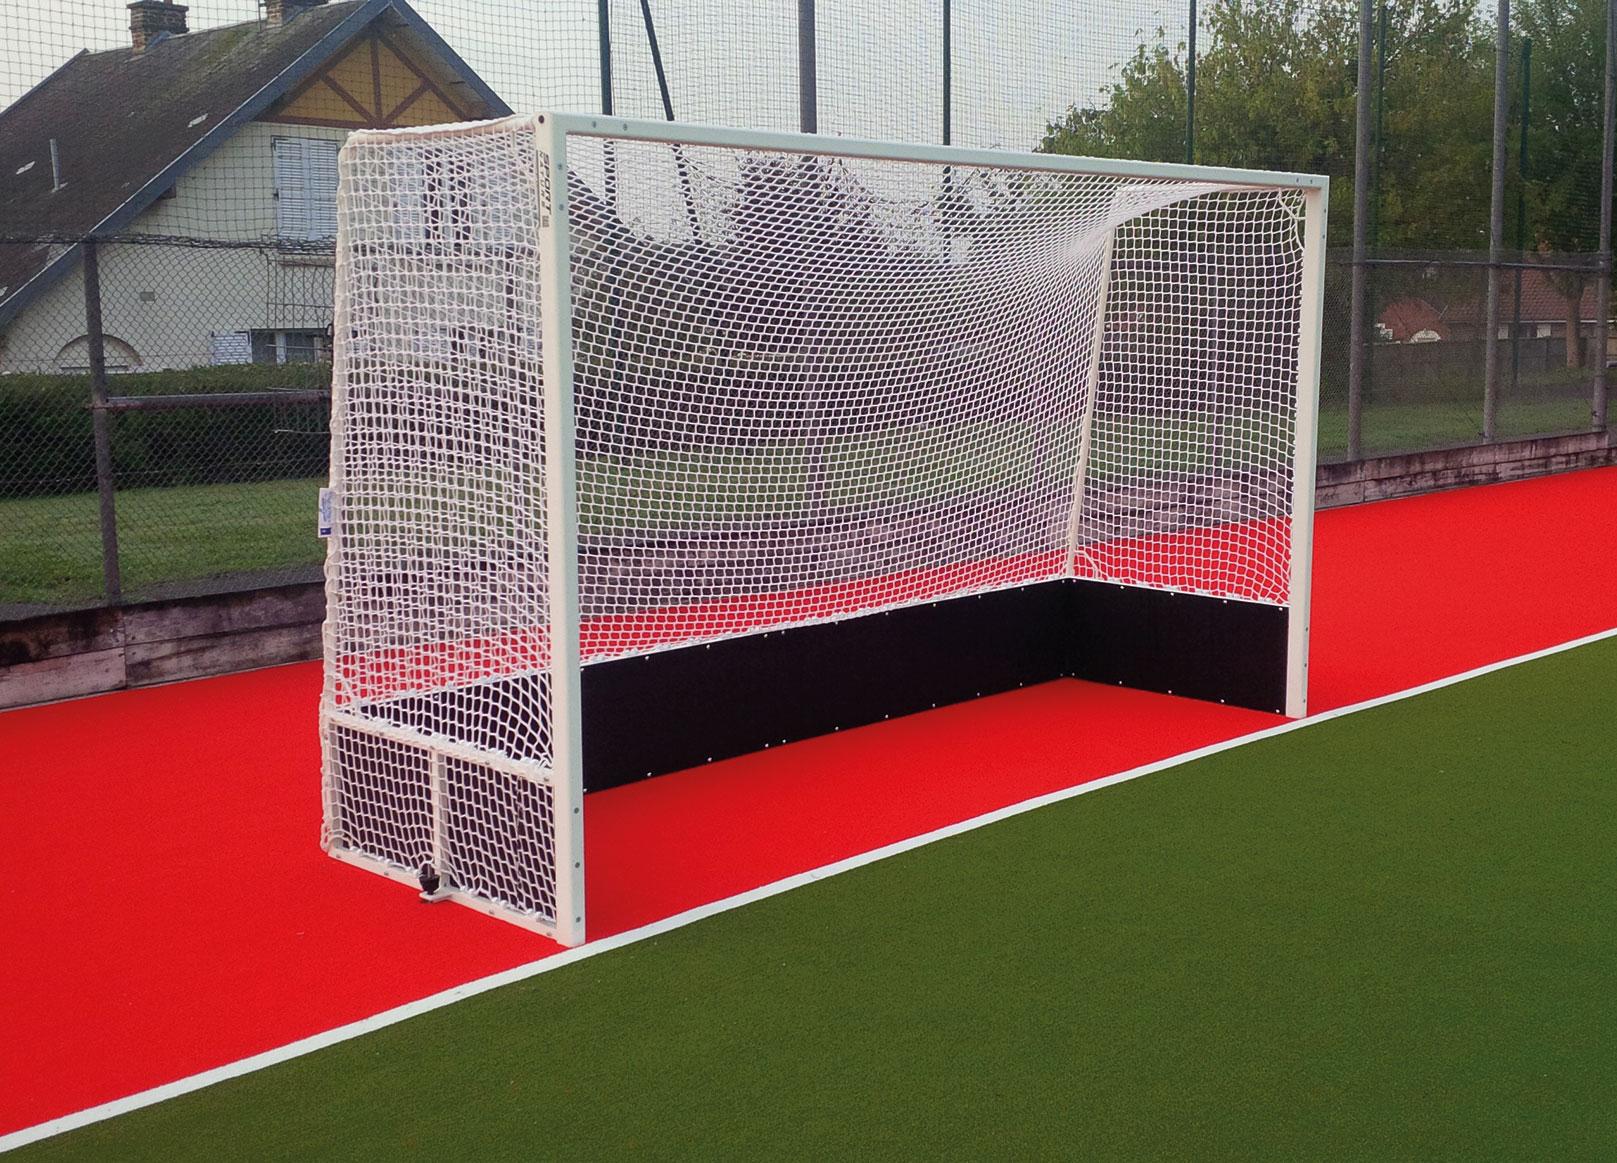 fabricant mat riel sportifs but hockey sur gazon sport. Black Bedroom Furniture Sets. Home Design Ideas